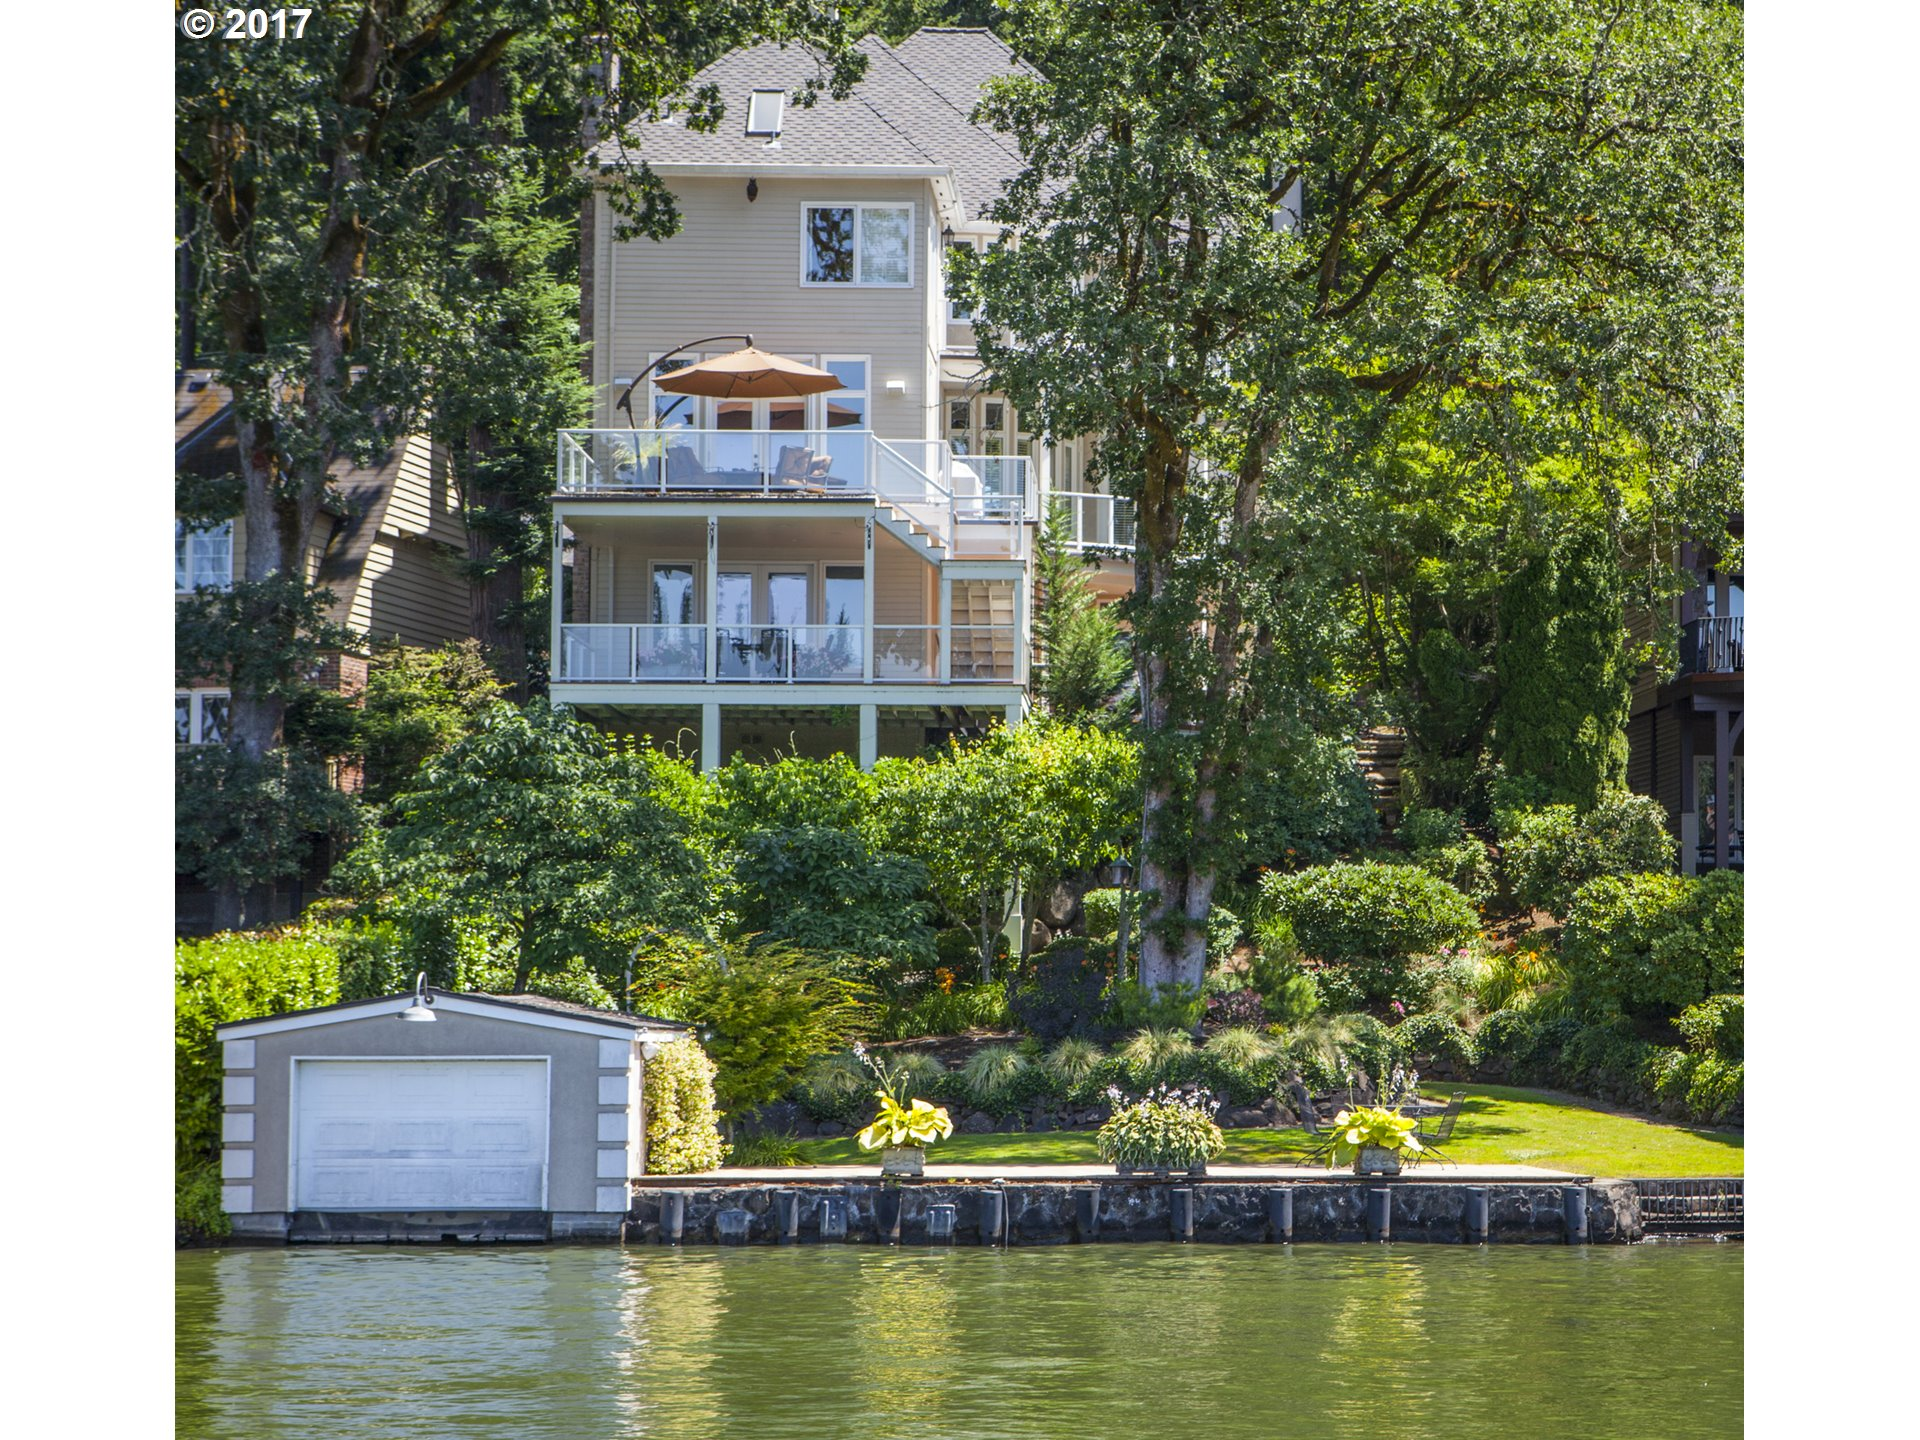 16865 GREENBRIER RD, Lake Oswego, OR 97034